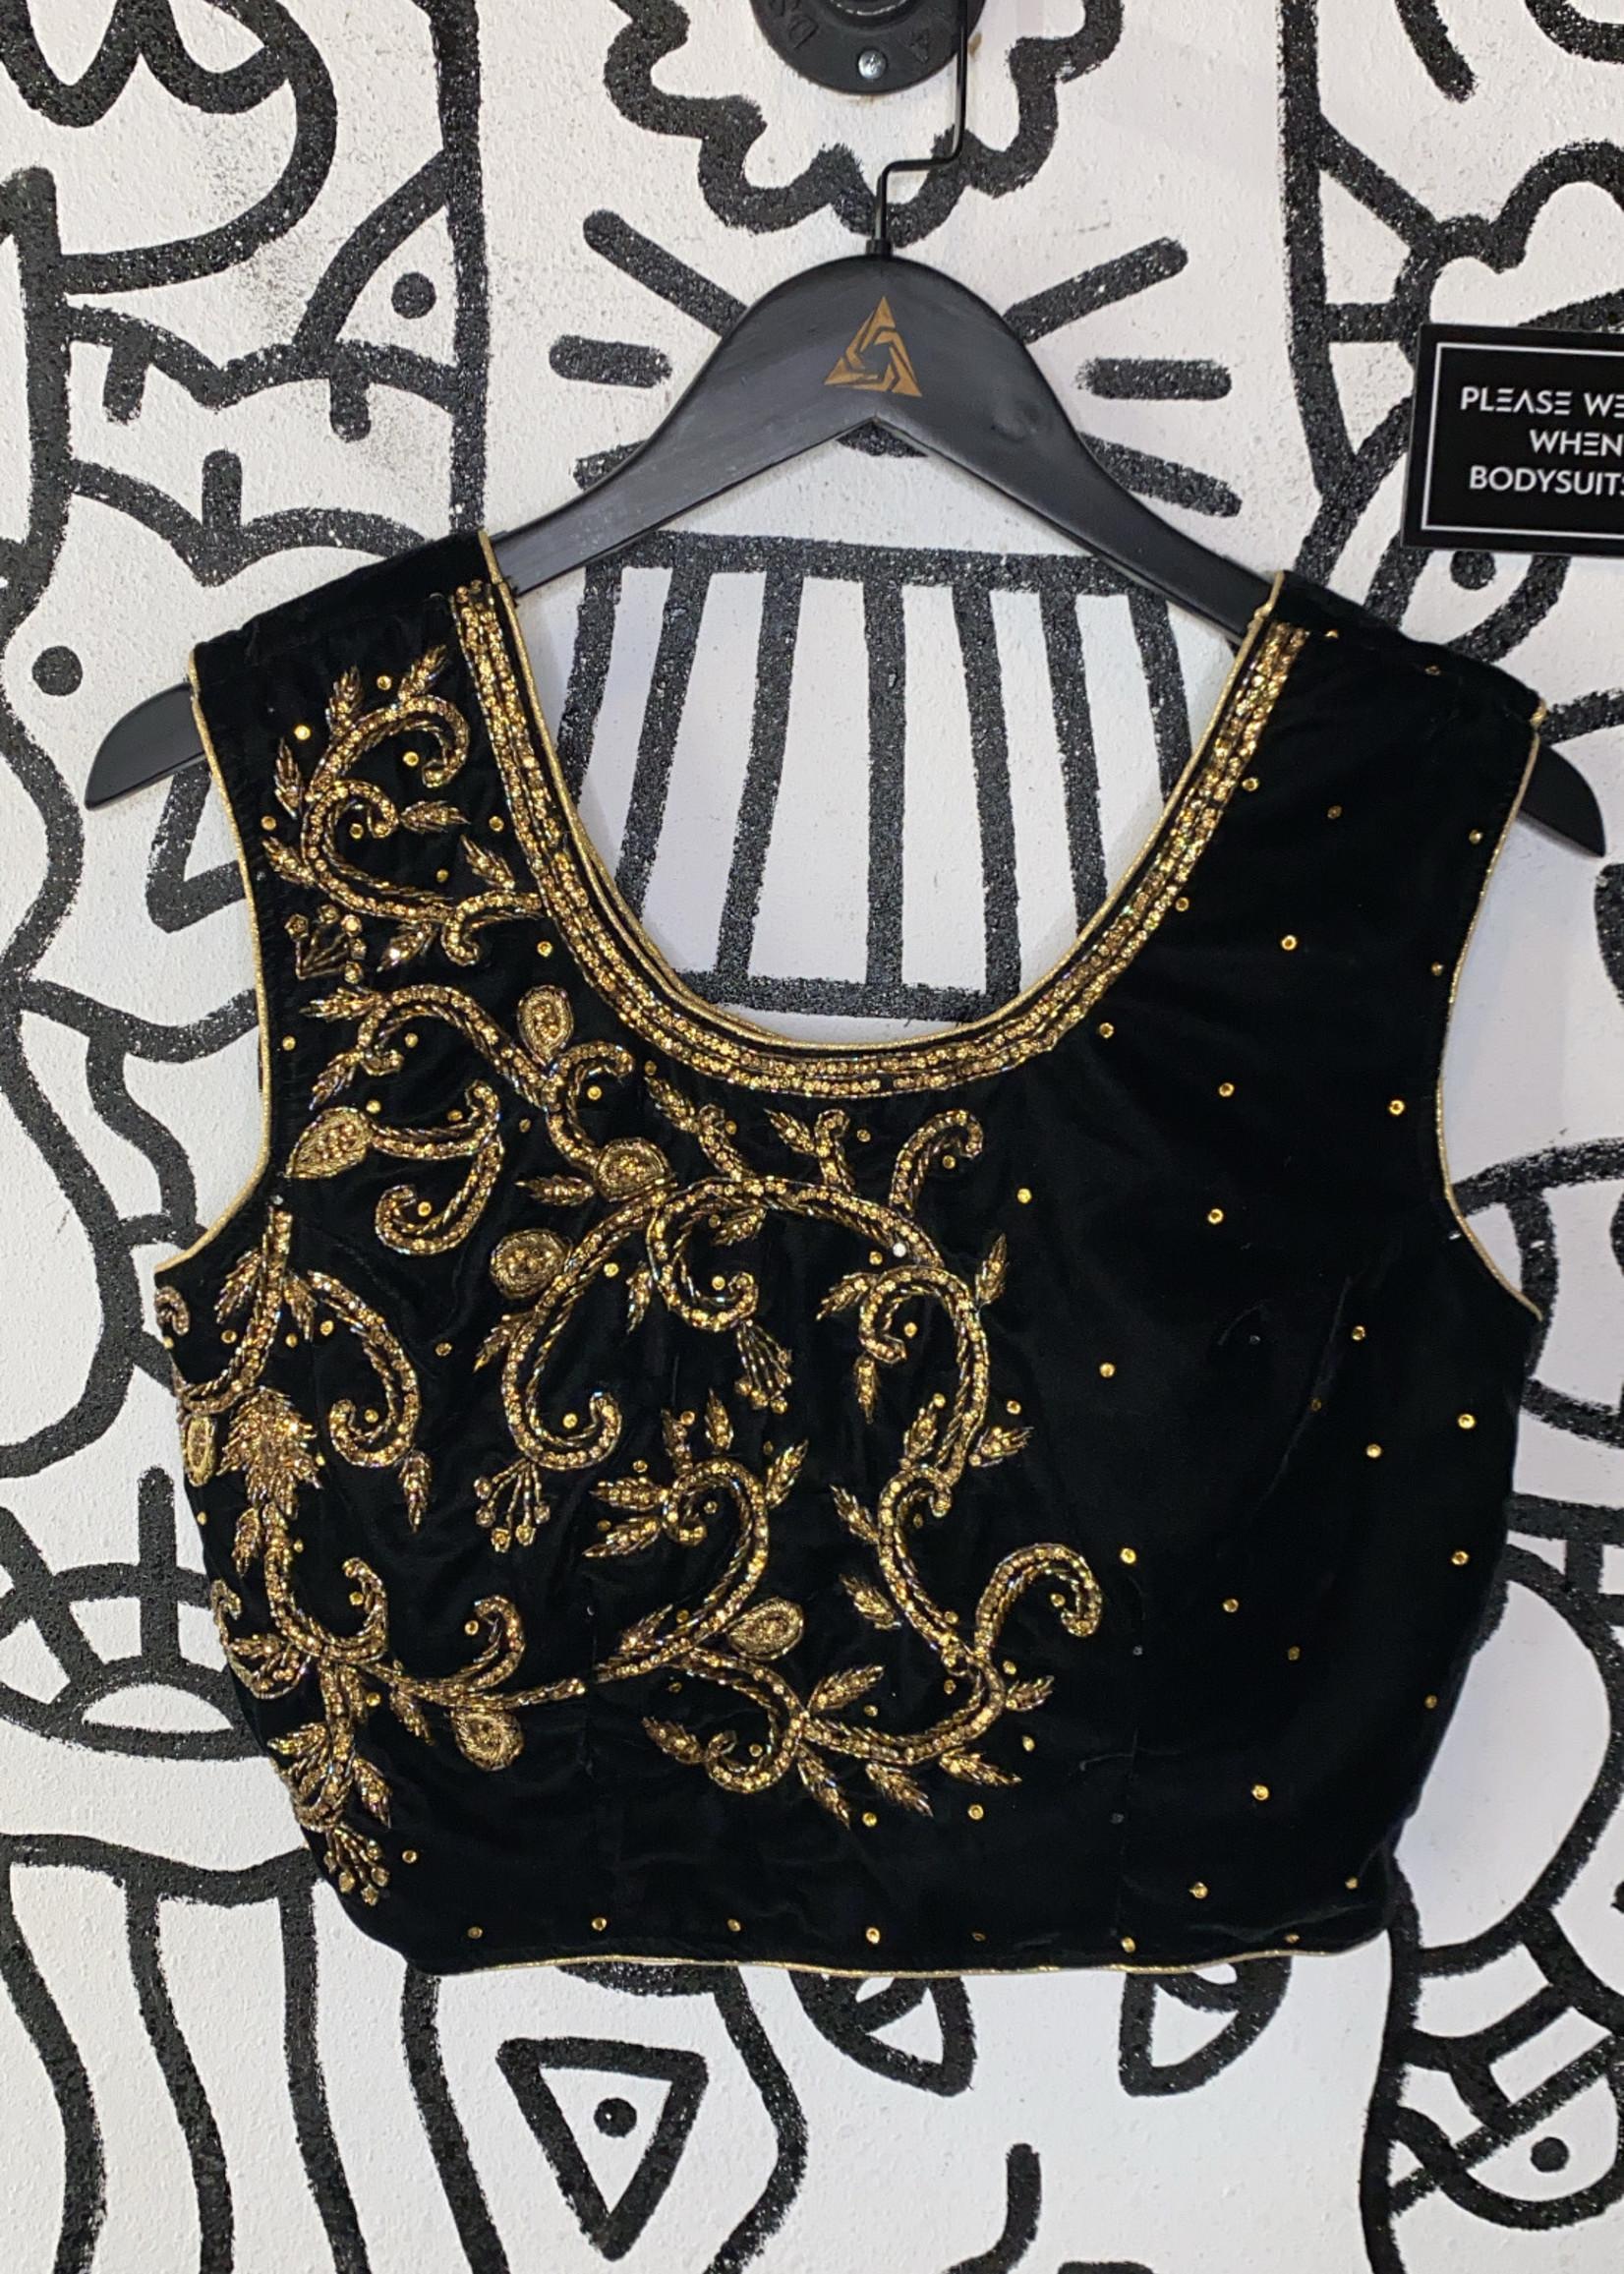 No Label Black Velvet Crop Tank with Gold Embellishment M